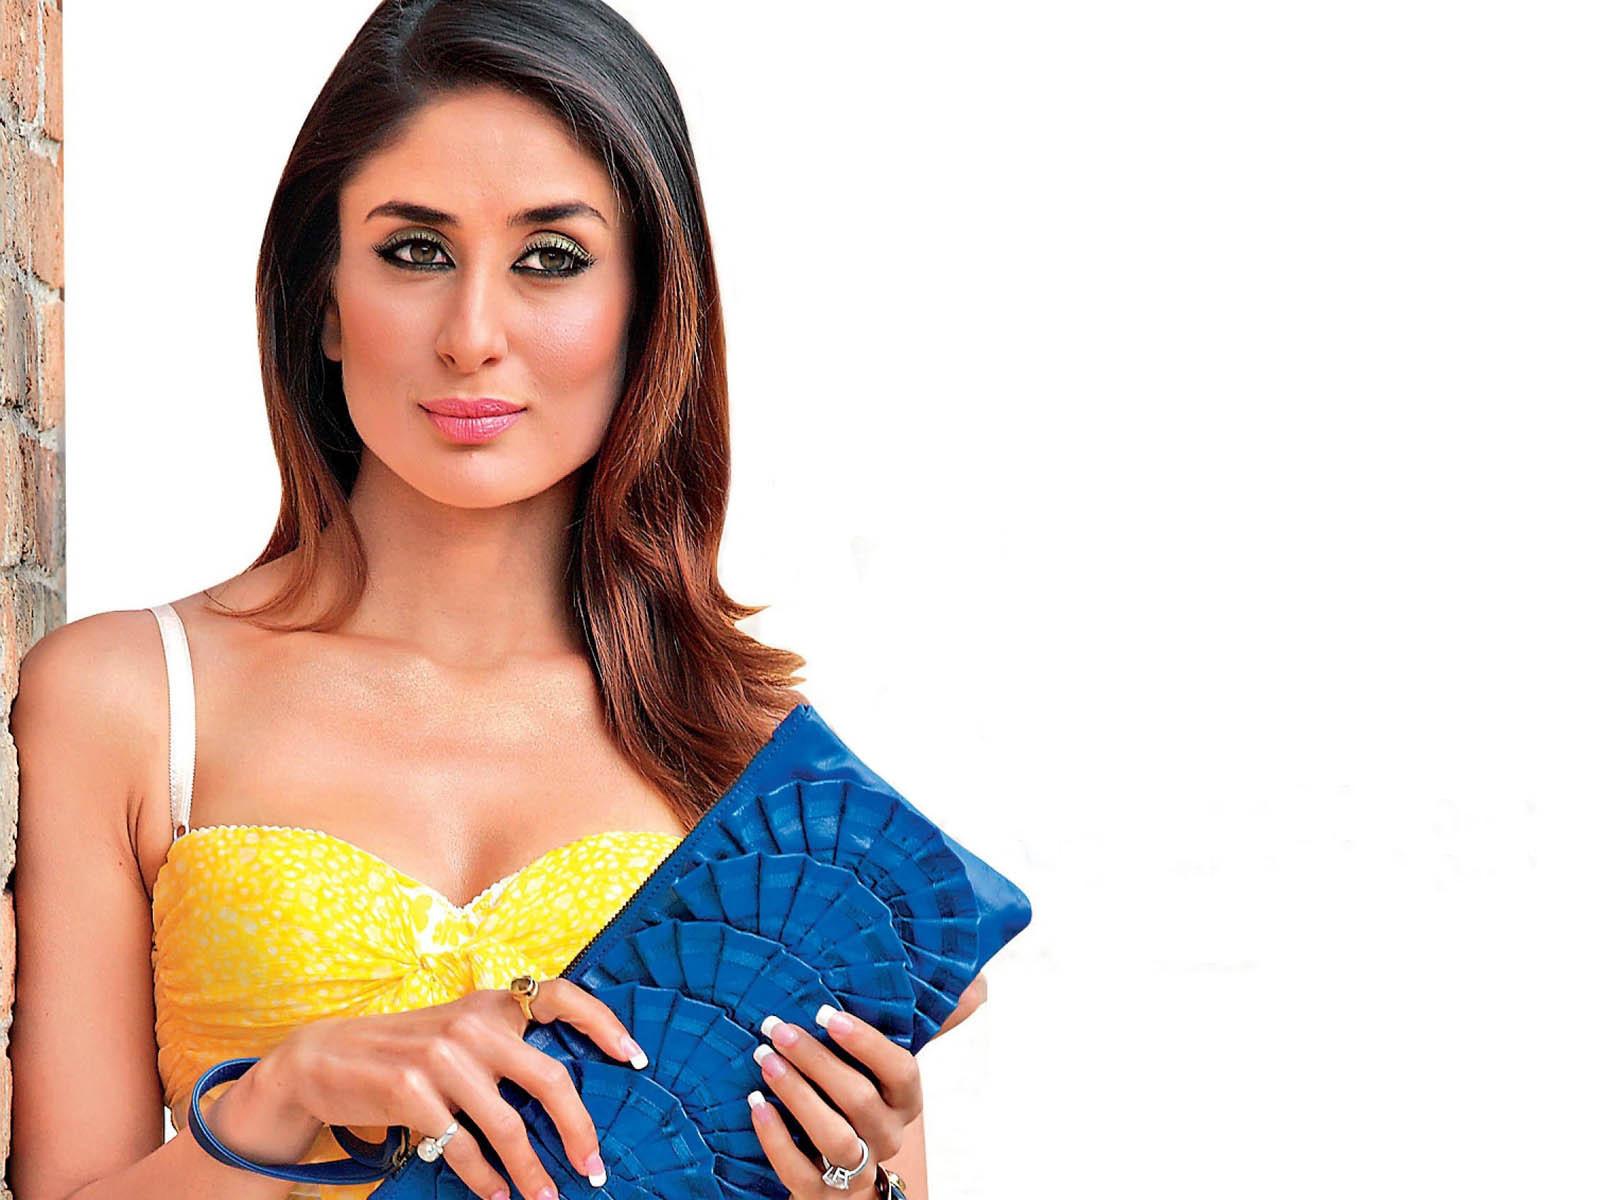 20 Best Of Kareena Kapoor Wallpapers That Are Too Hot To Handle - Funroundupcom-9871